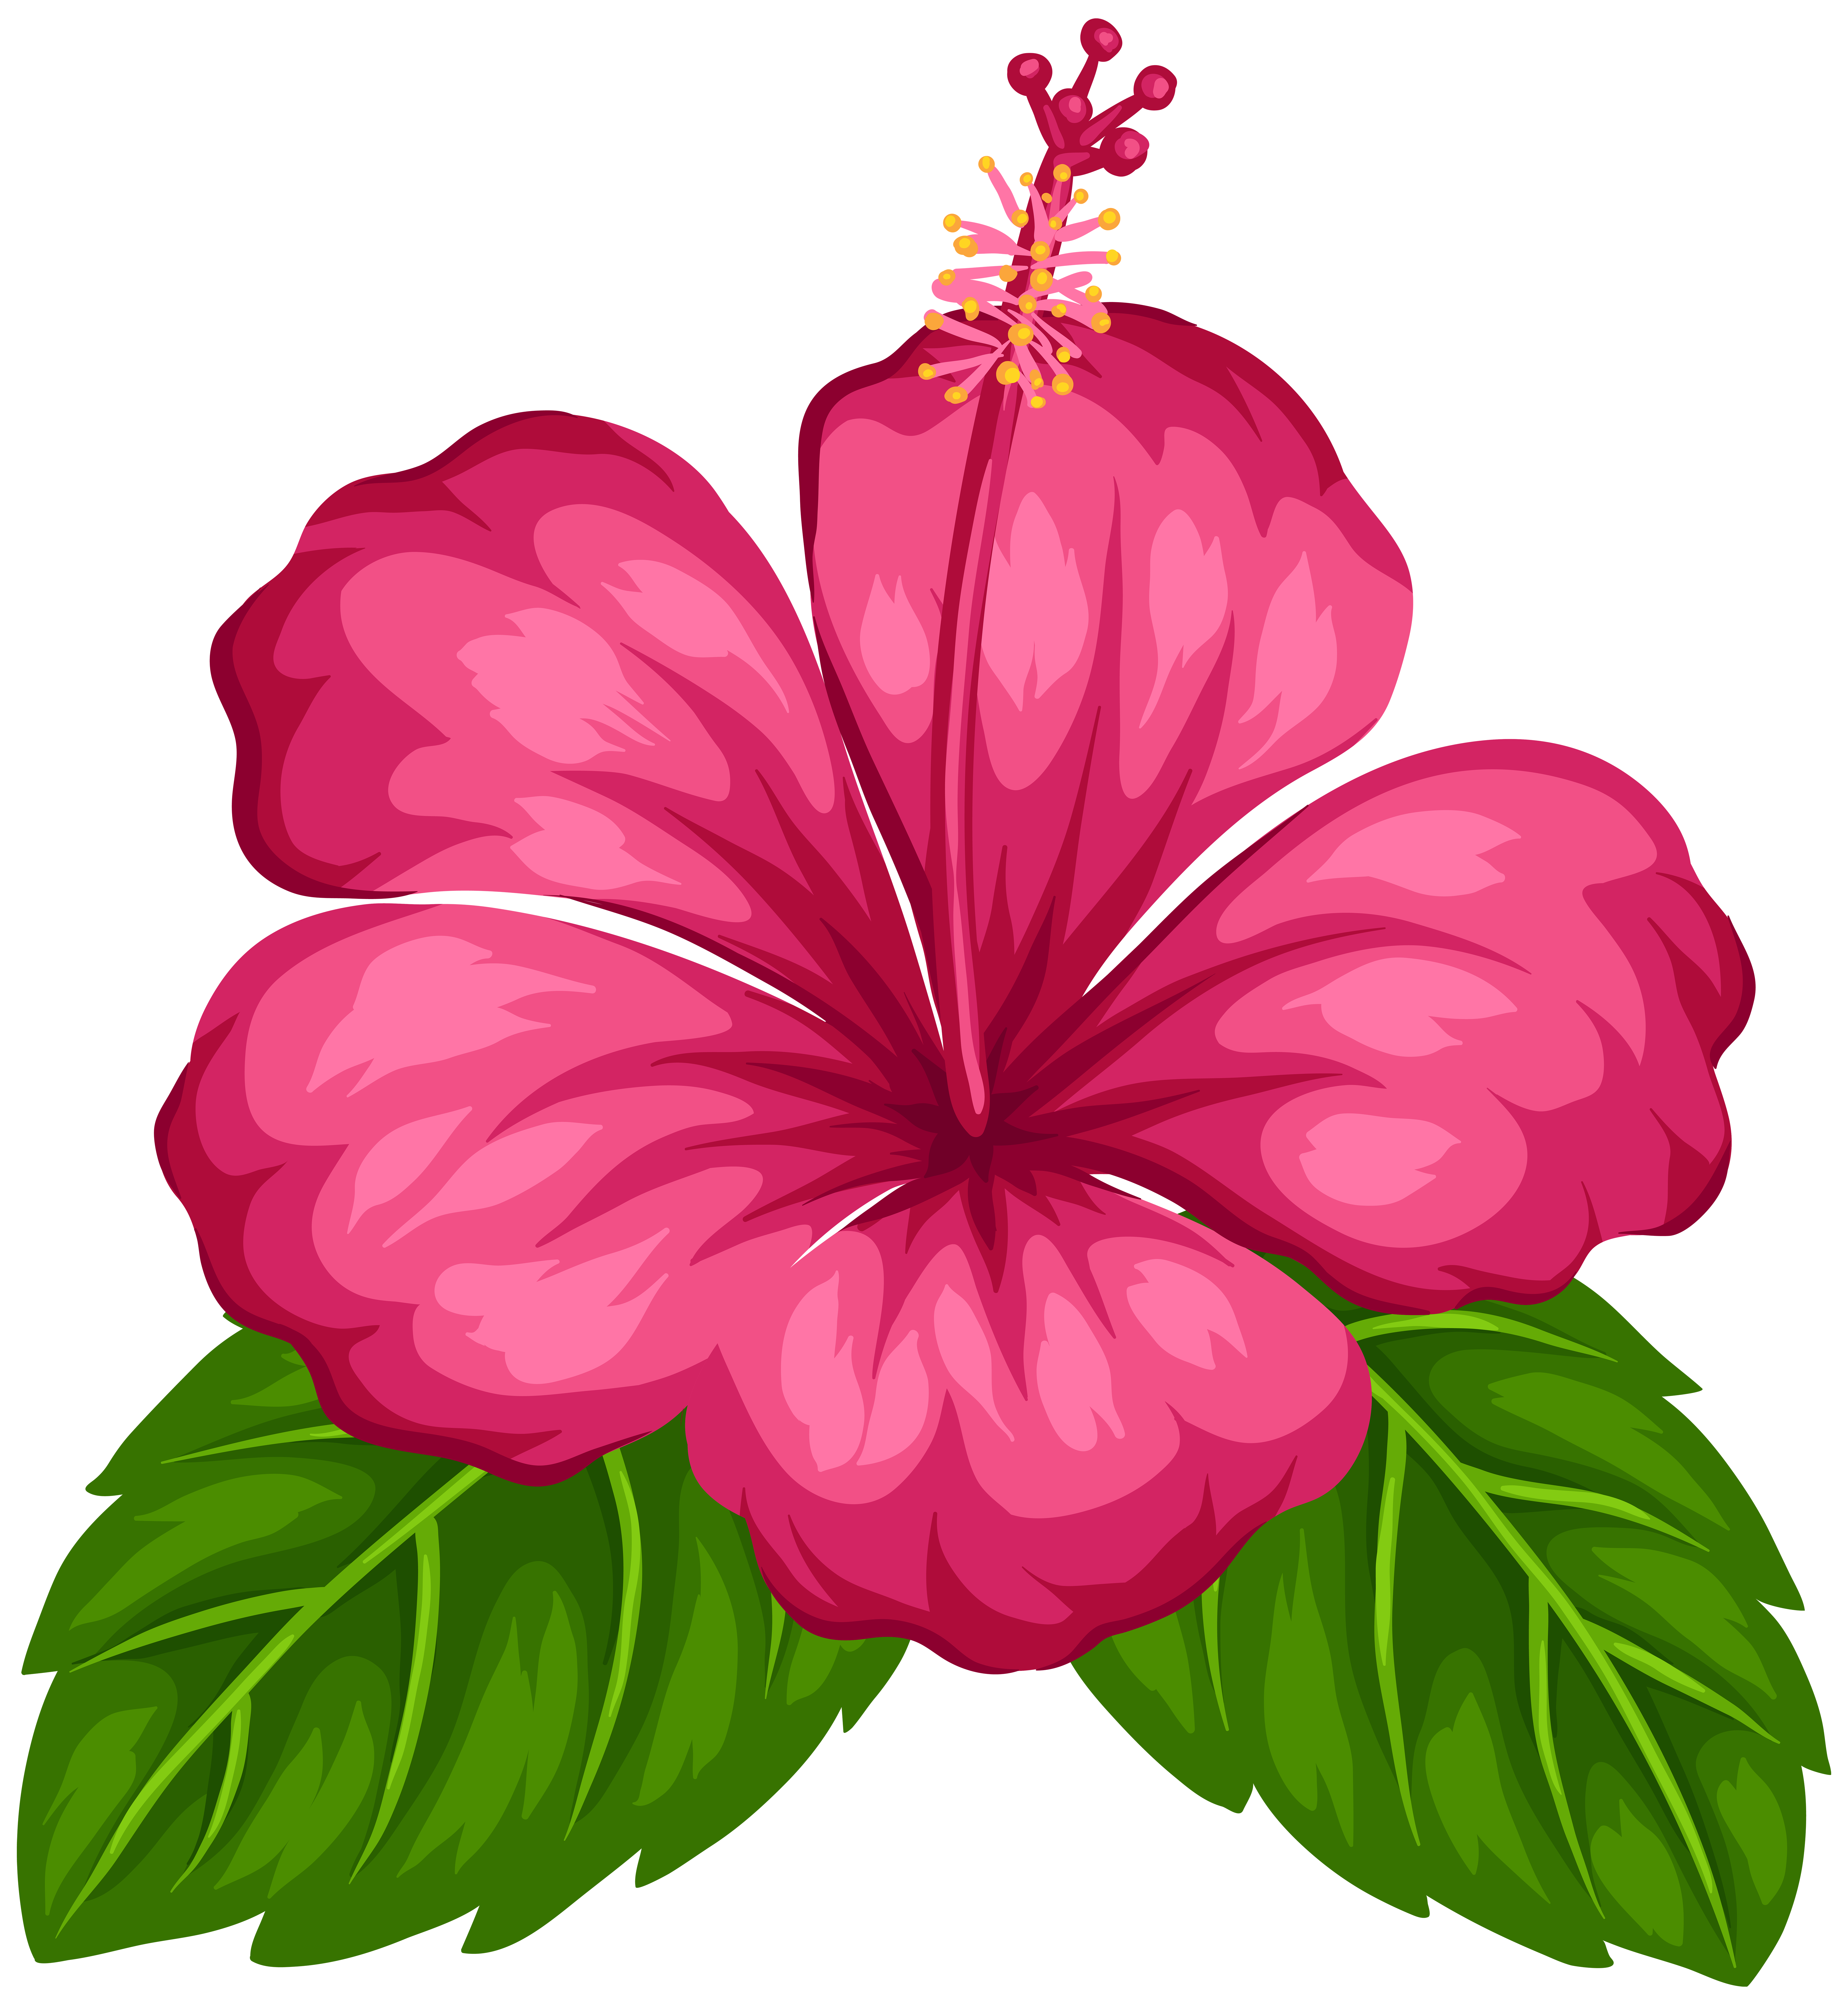 Flower capsules clipart #4